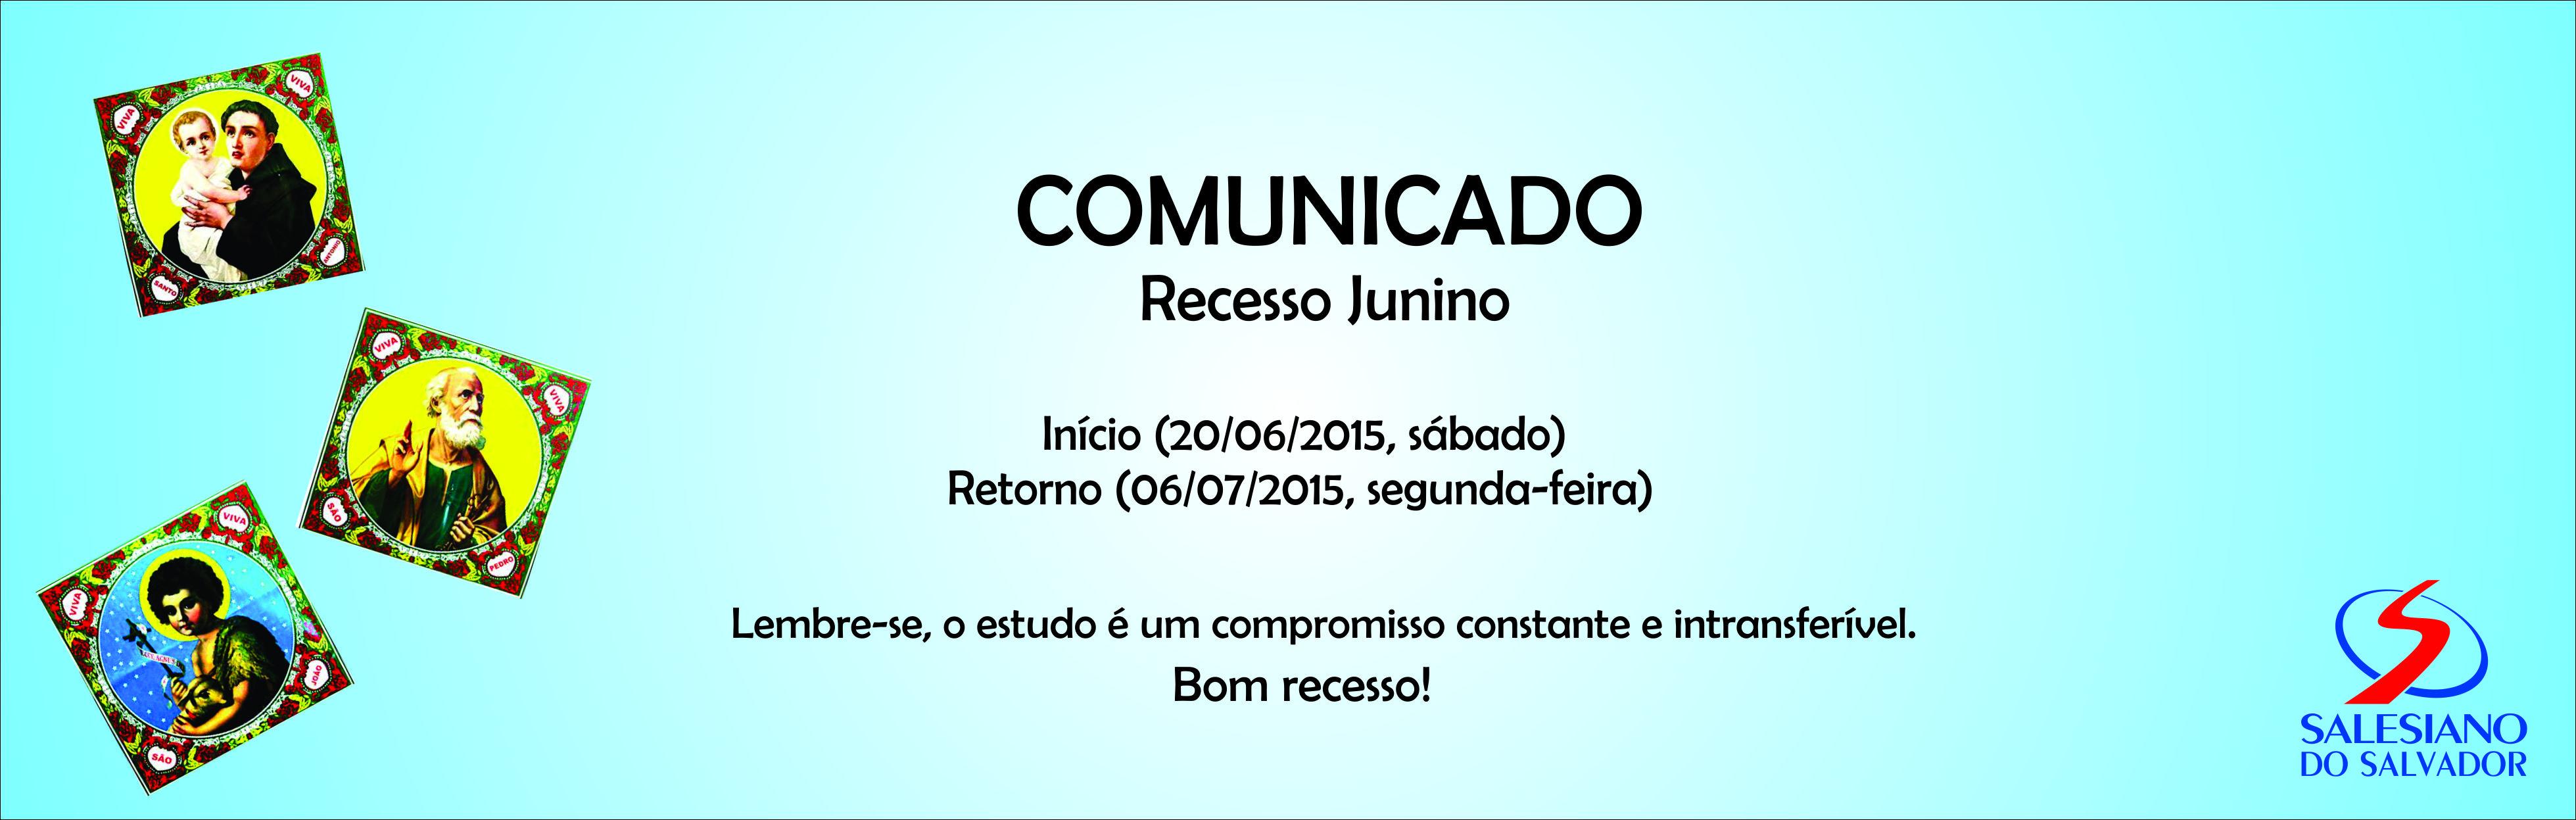 Comunicado_s_o_jo_o_aprovado